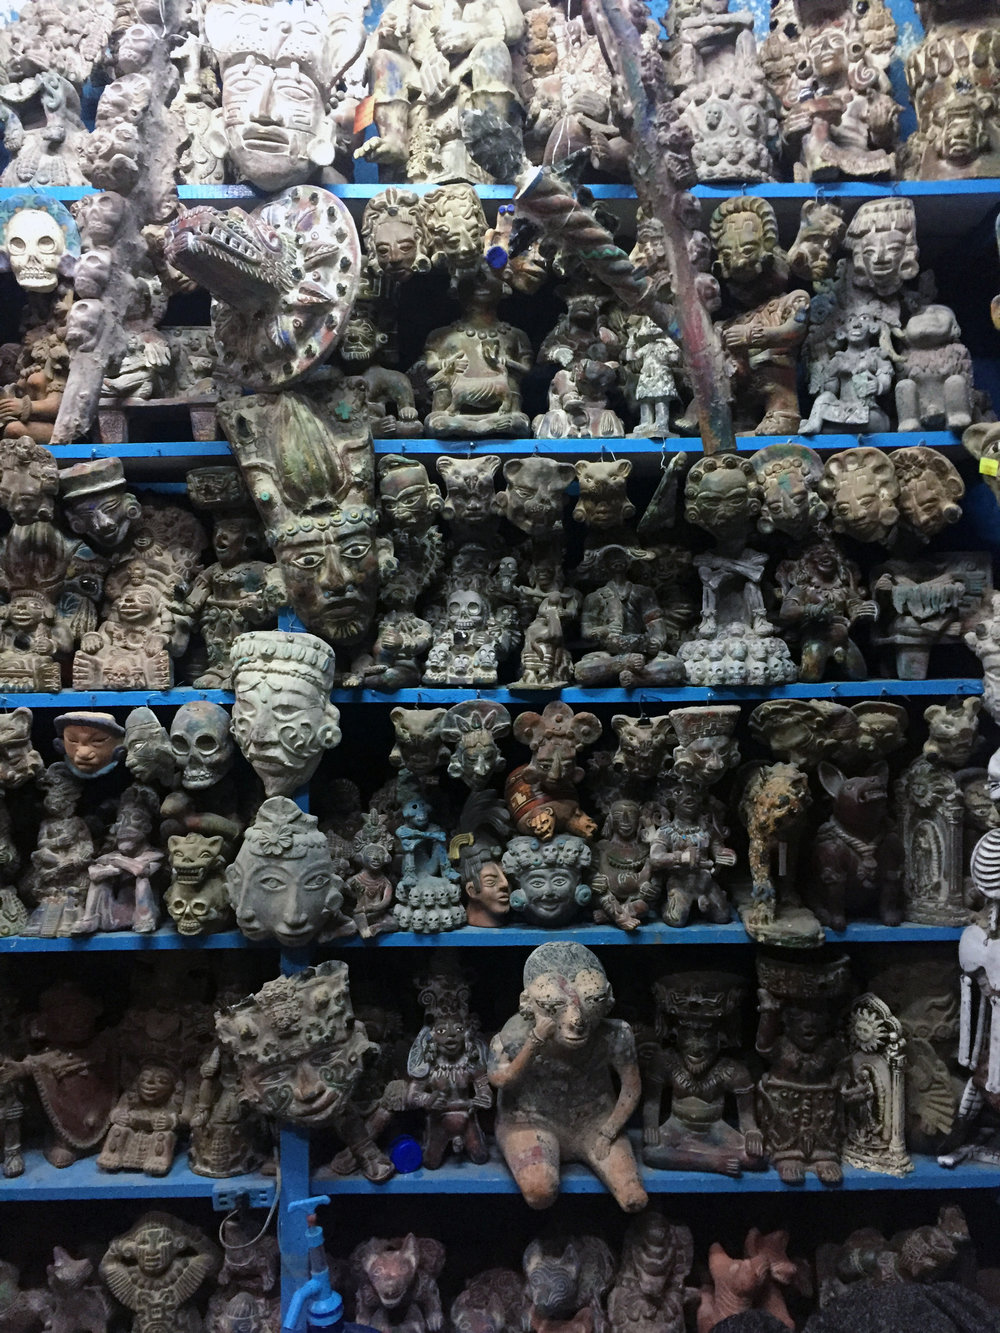 Skull sculptures at the artisanal market.